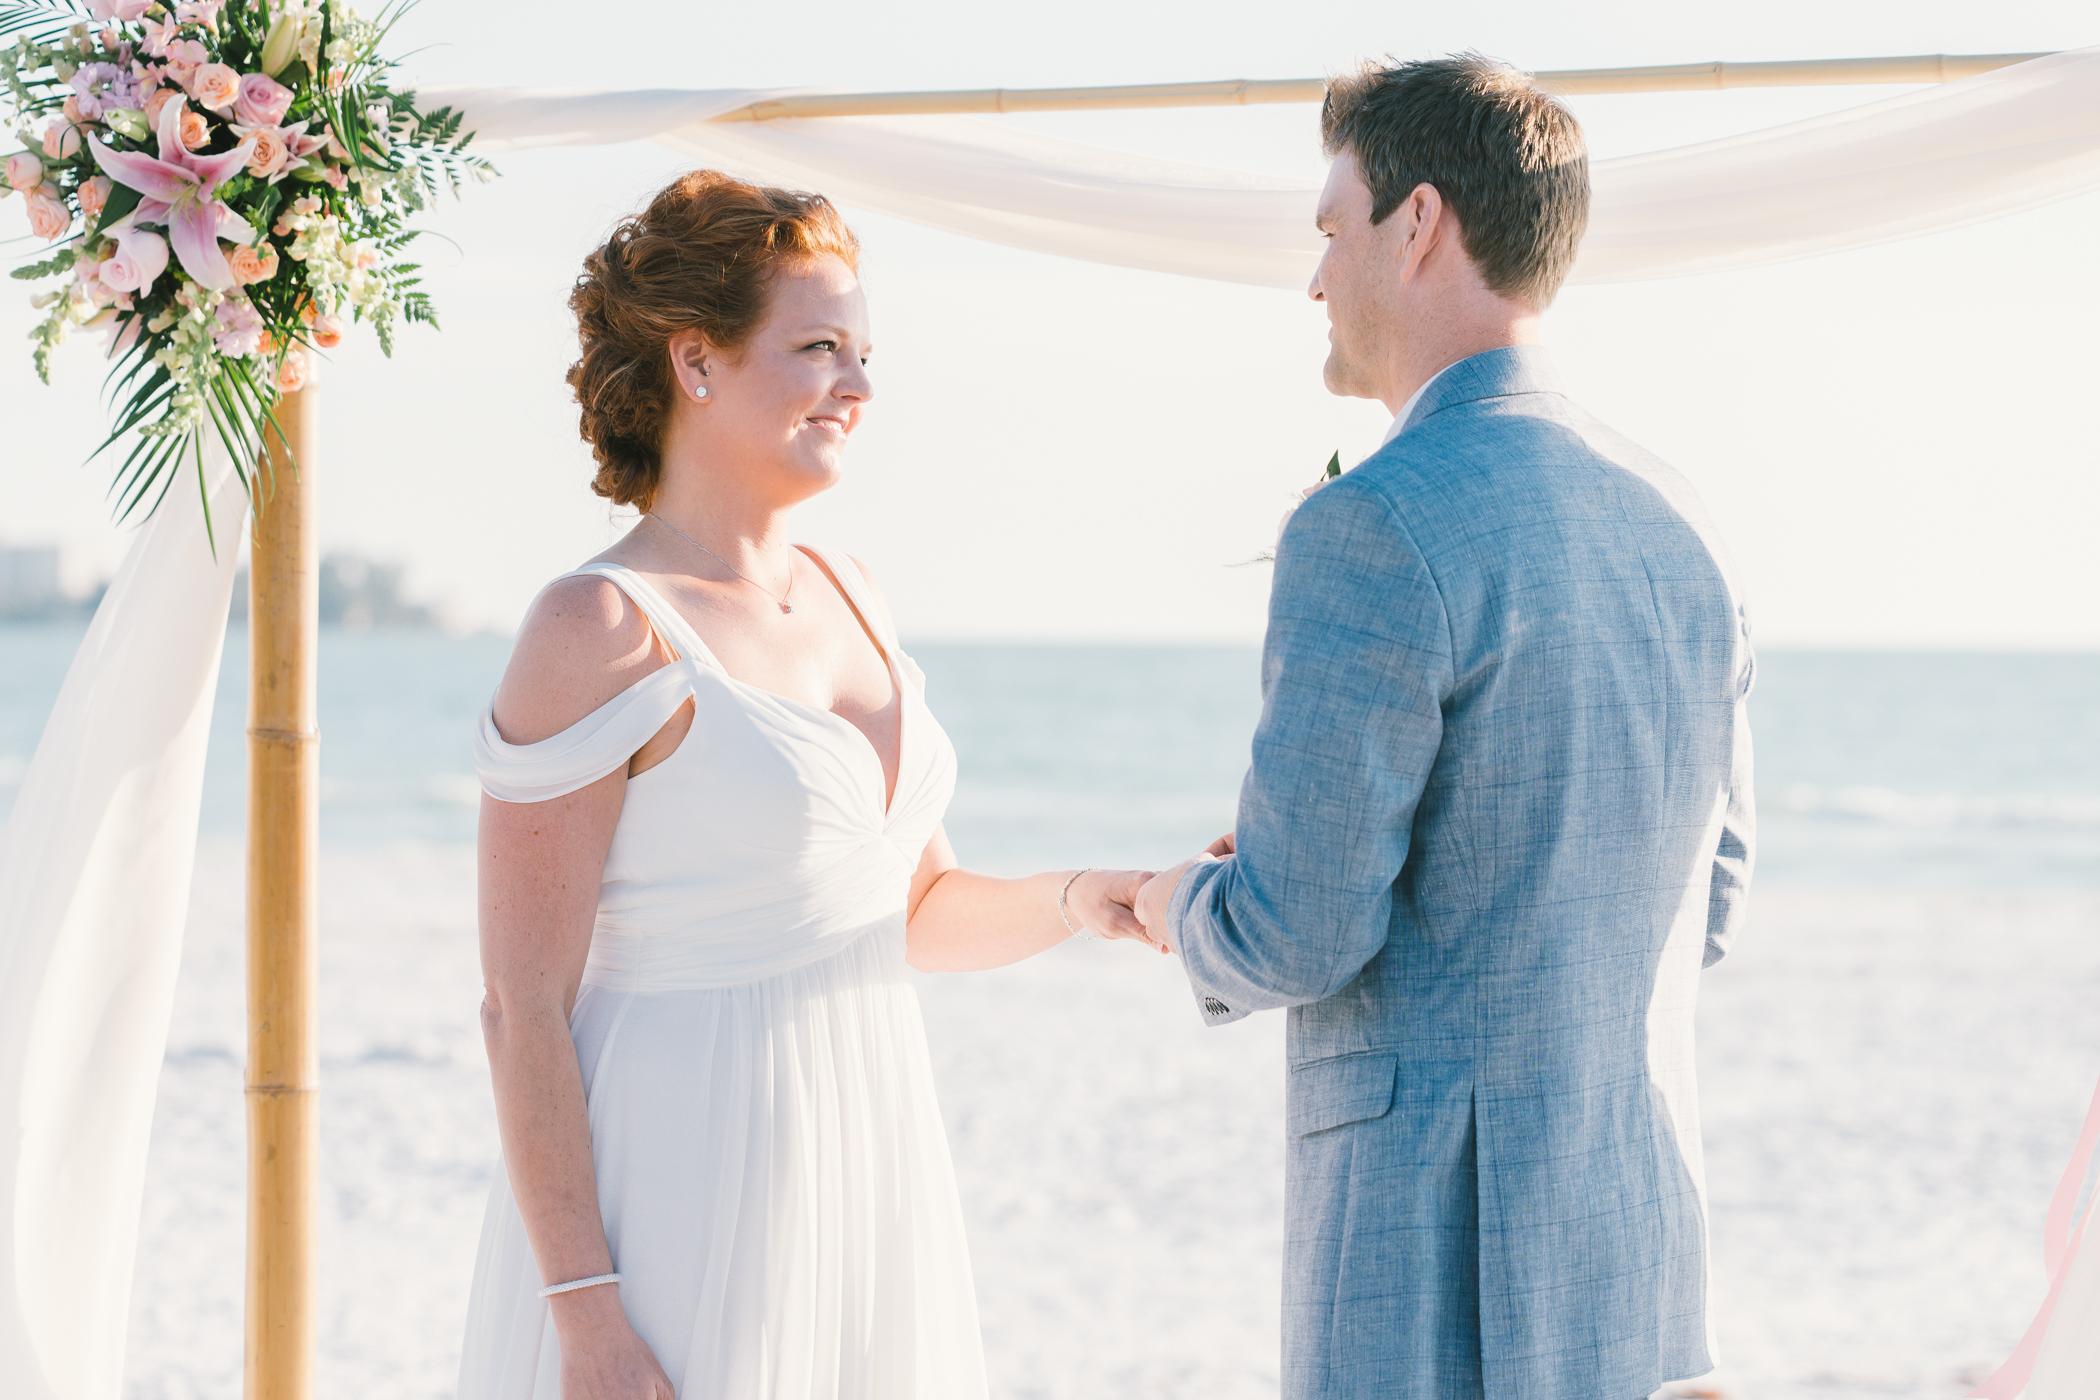 Lido-key-beach-wedding-photo, ring-vows, Sarasota-beach-wedding